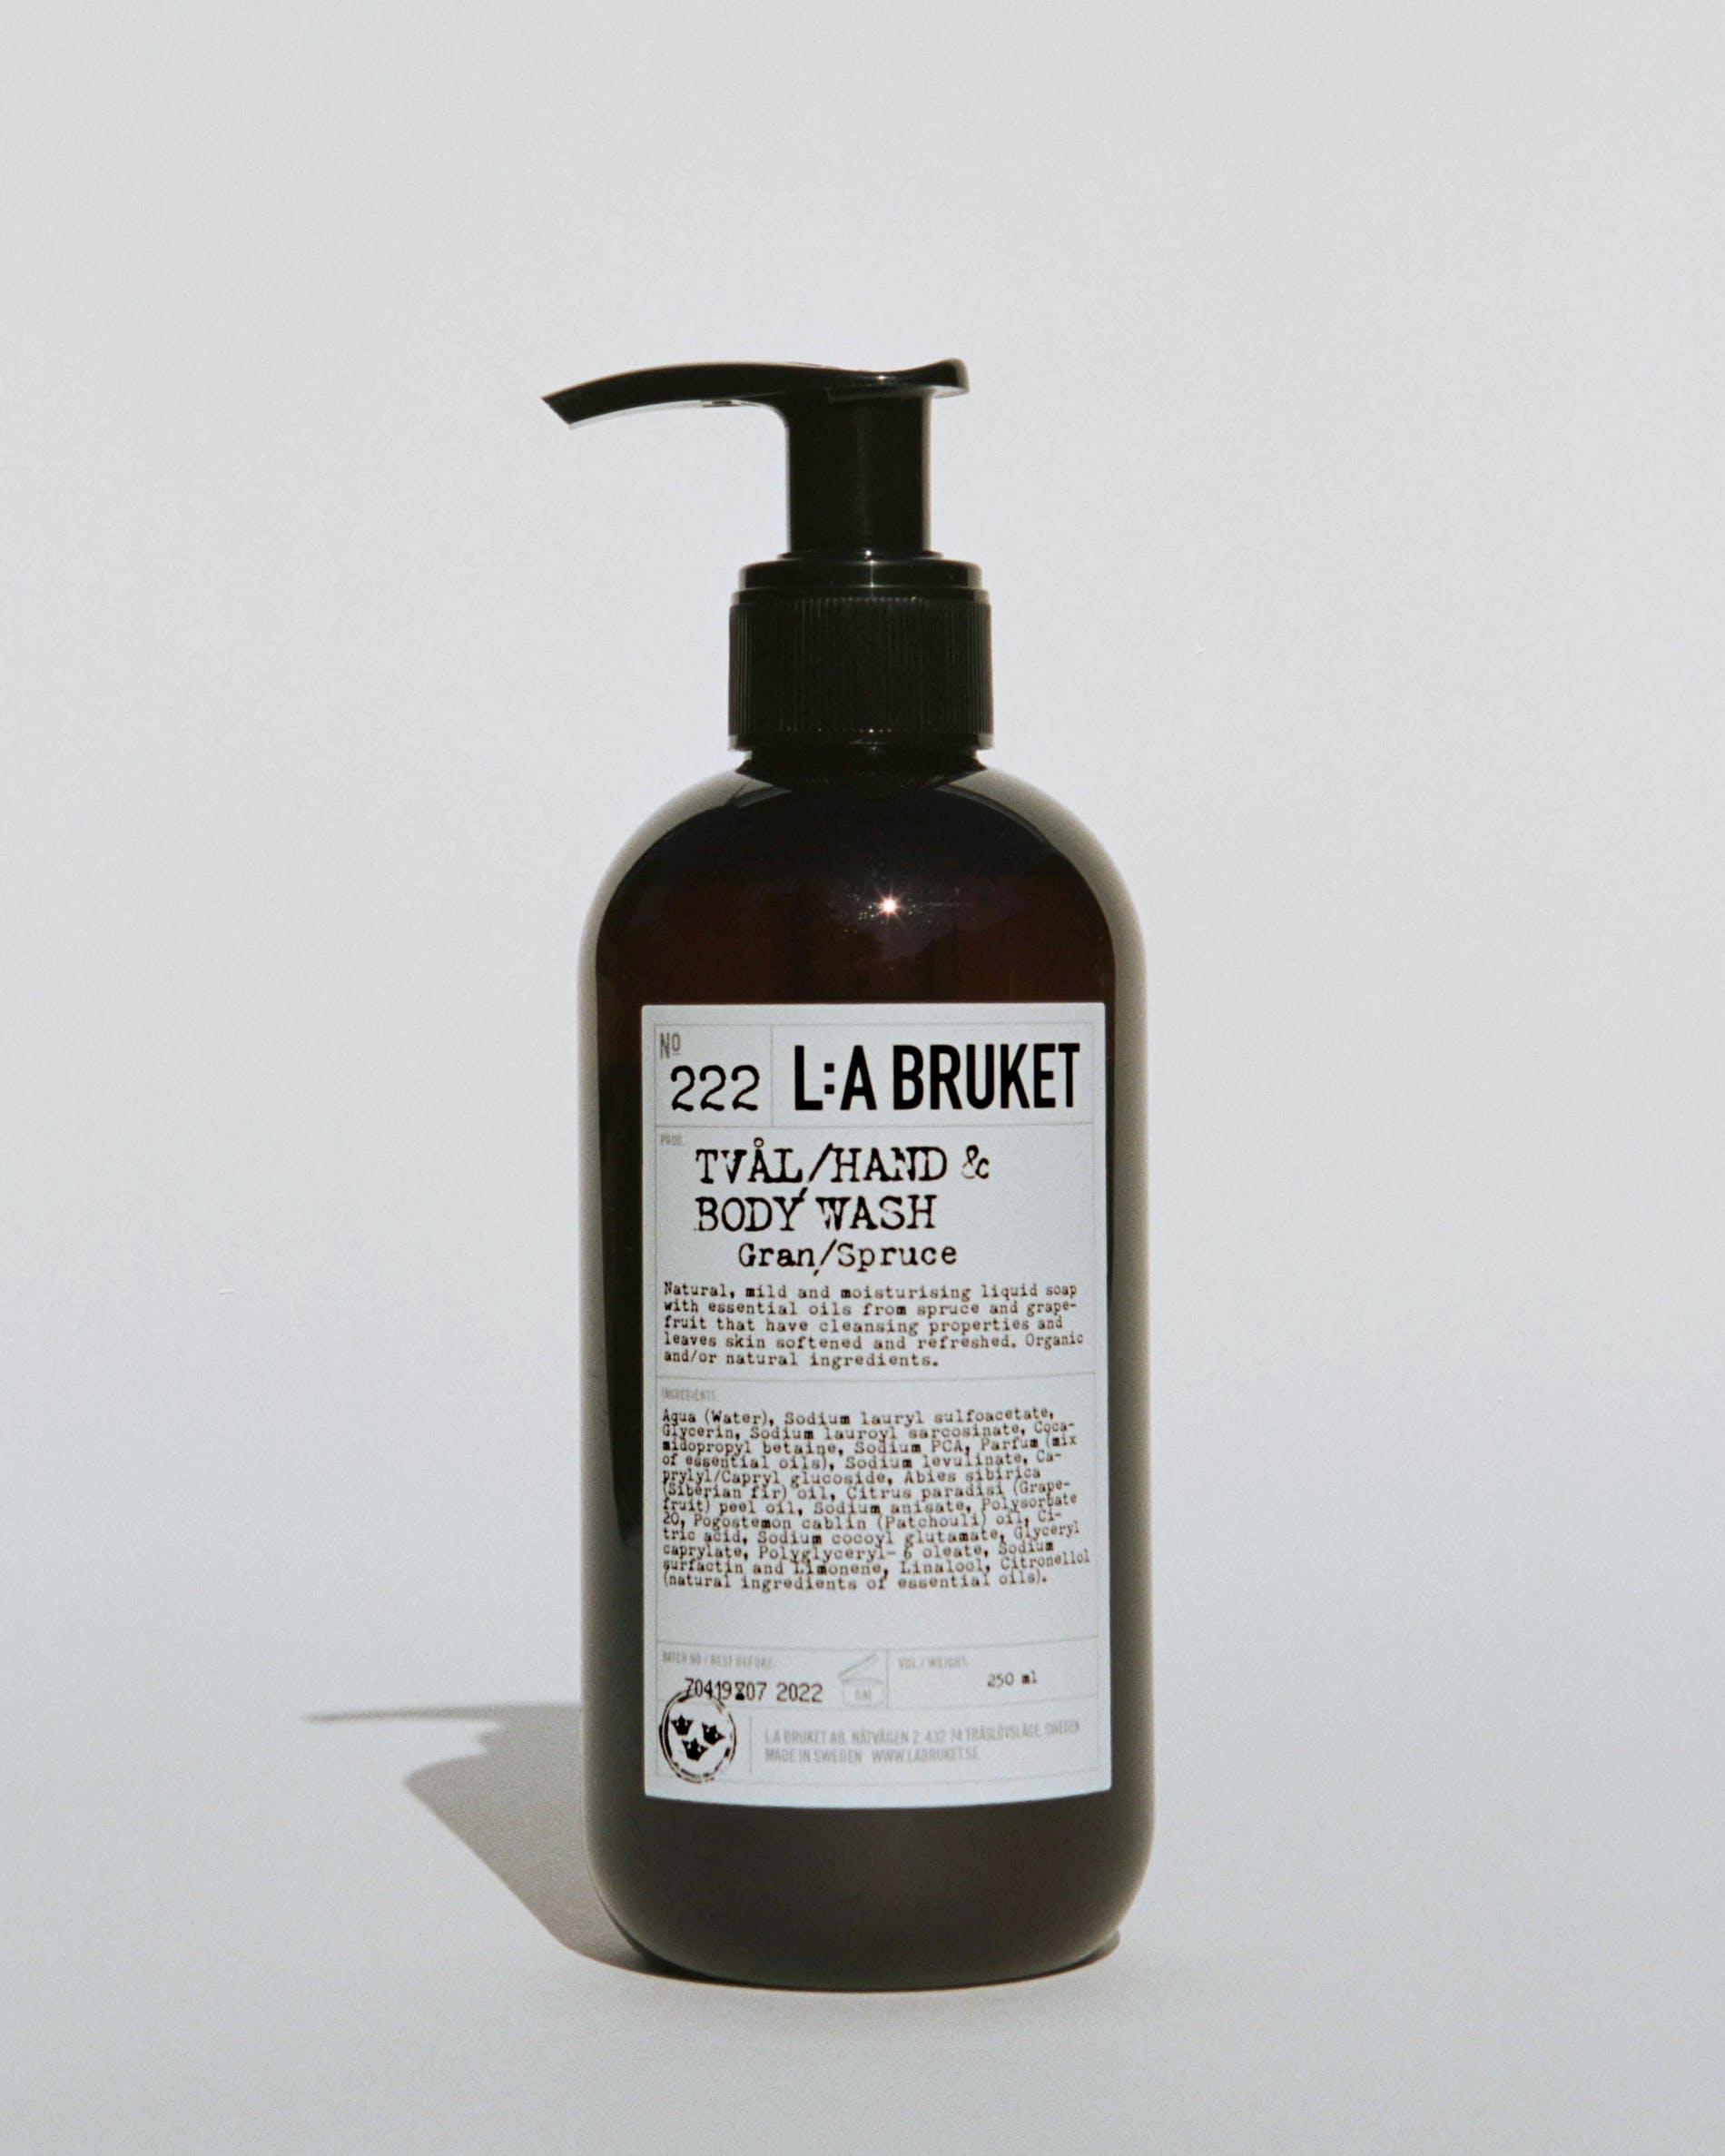 L:a Bruket No. 222 hånd- og bodysæbe, 240 ml, Gran/Spruce